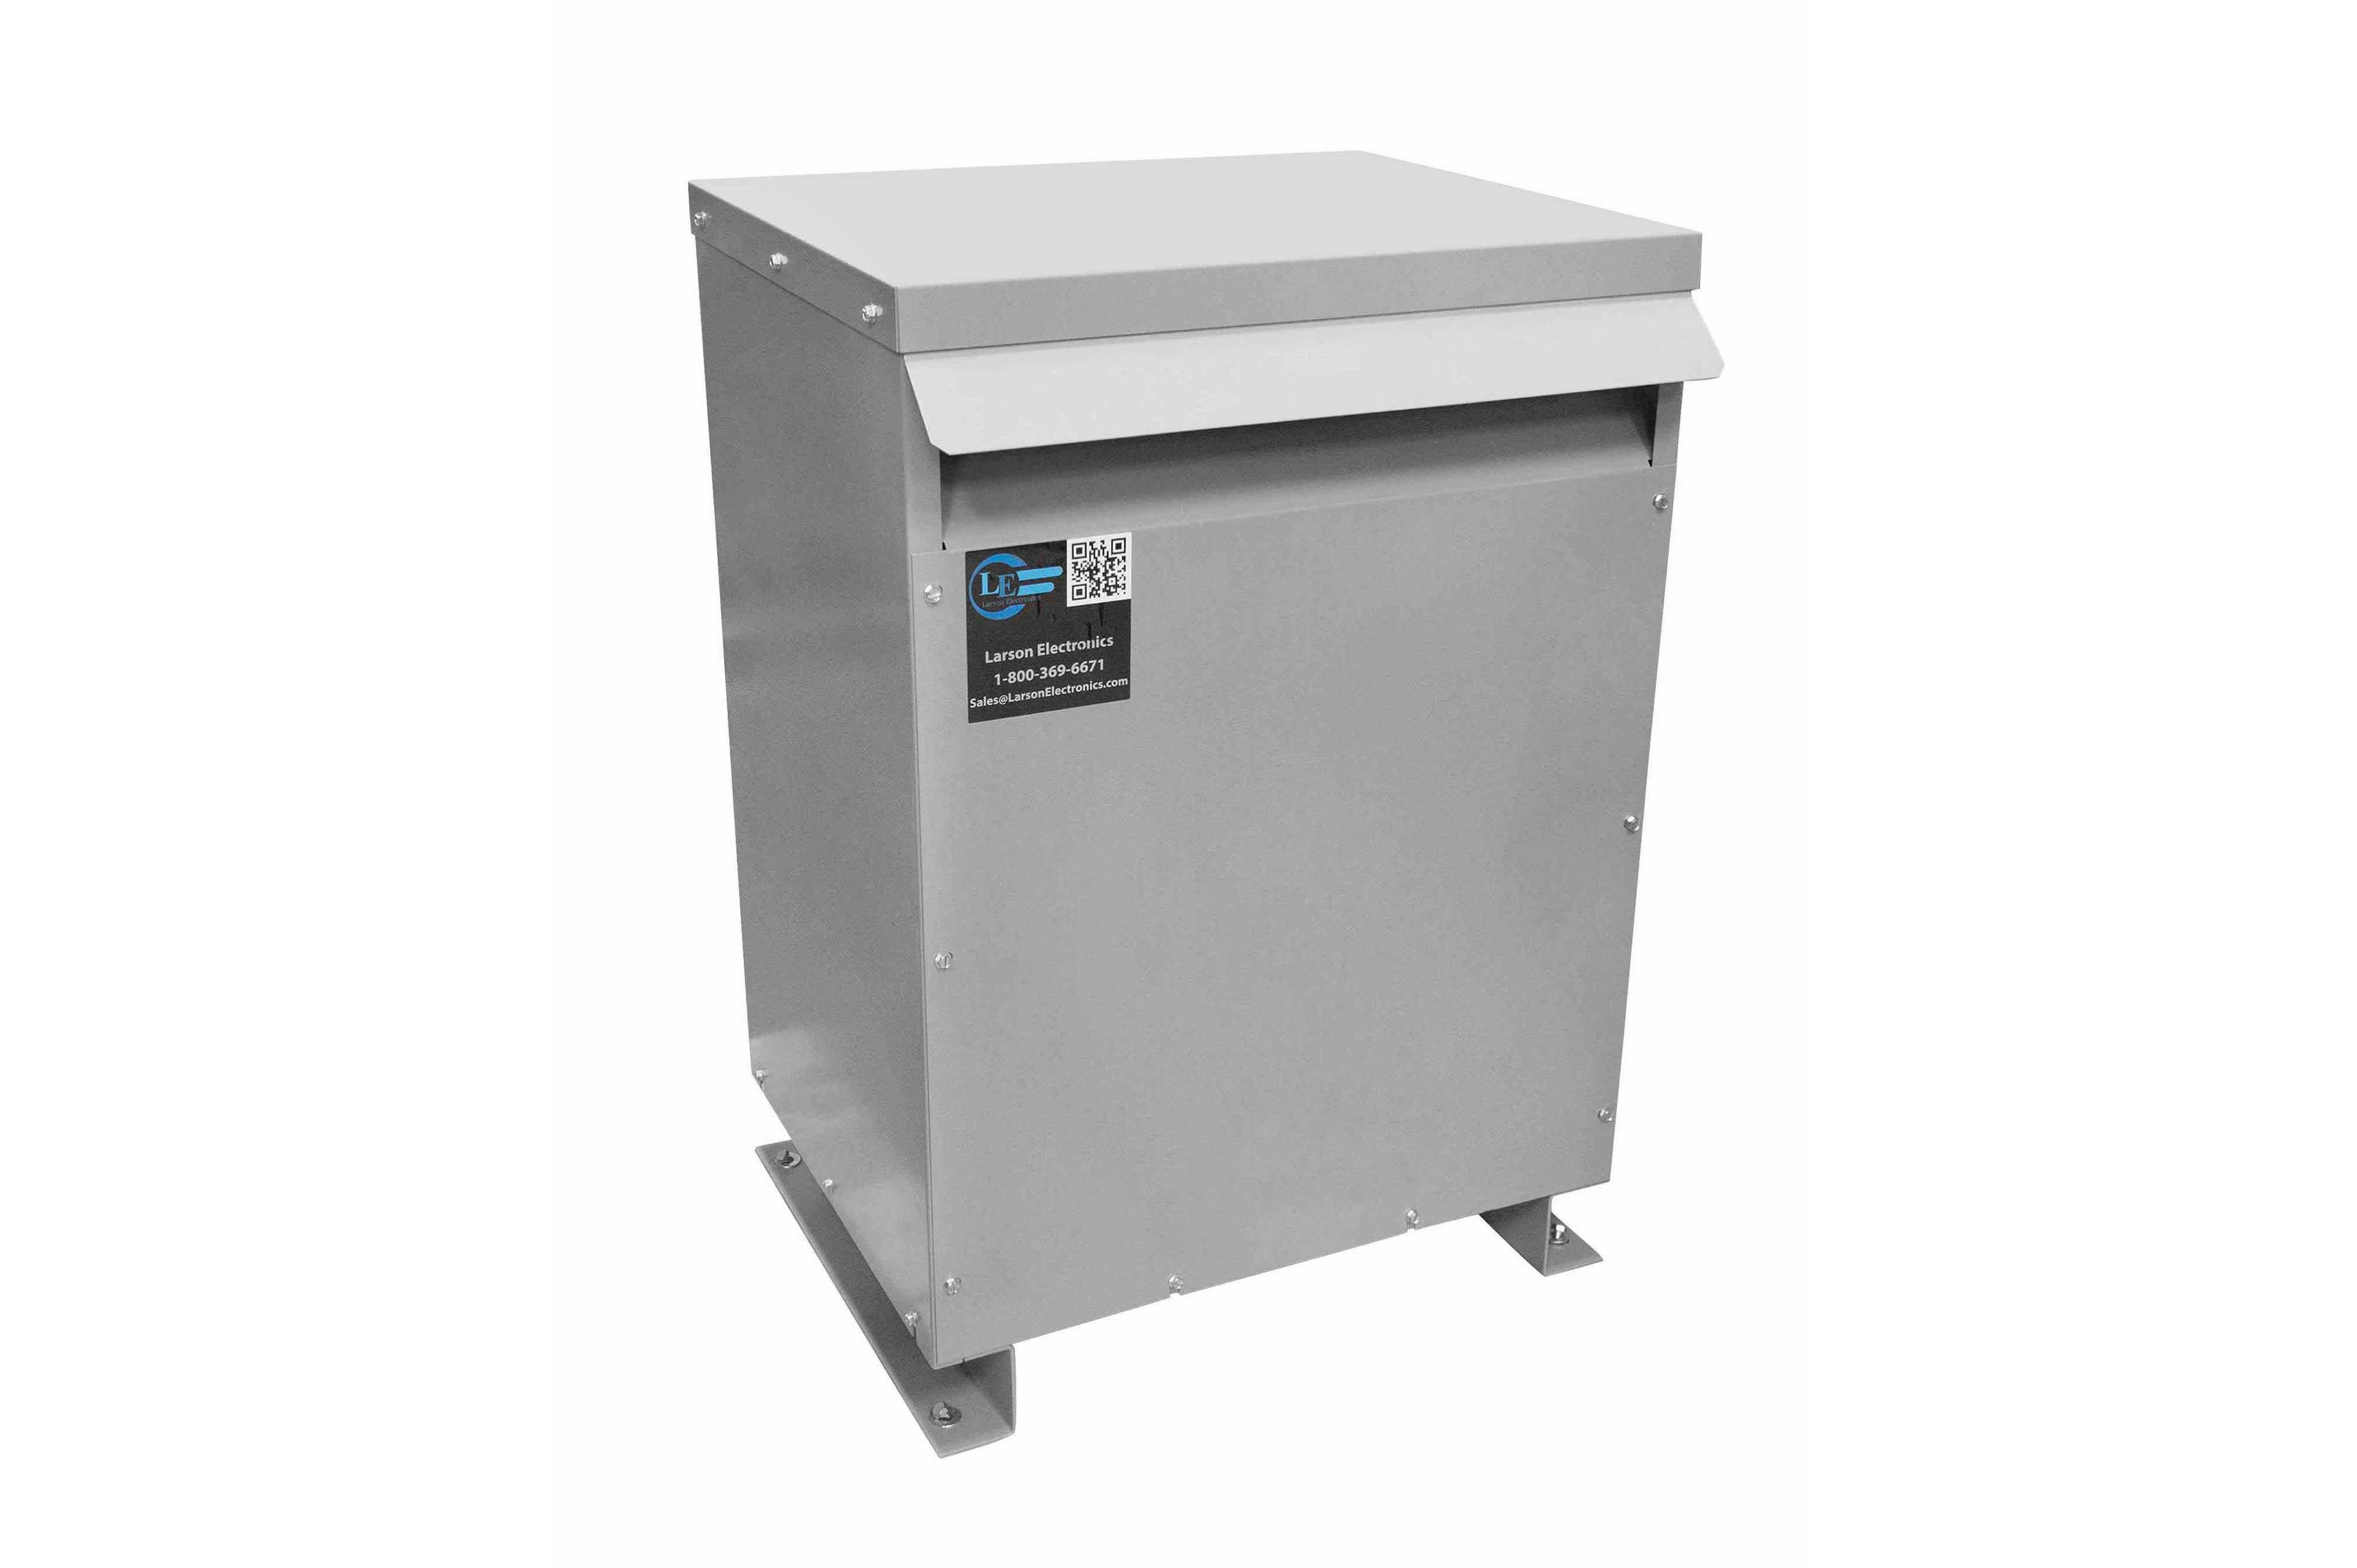 20 kVA 3PH Isolation Transformer, 415V Wye Primary, 208V Delta Secondary, N3R, Ventilated, 60 Hz